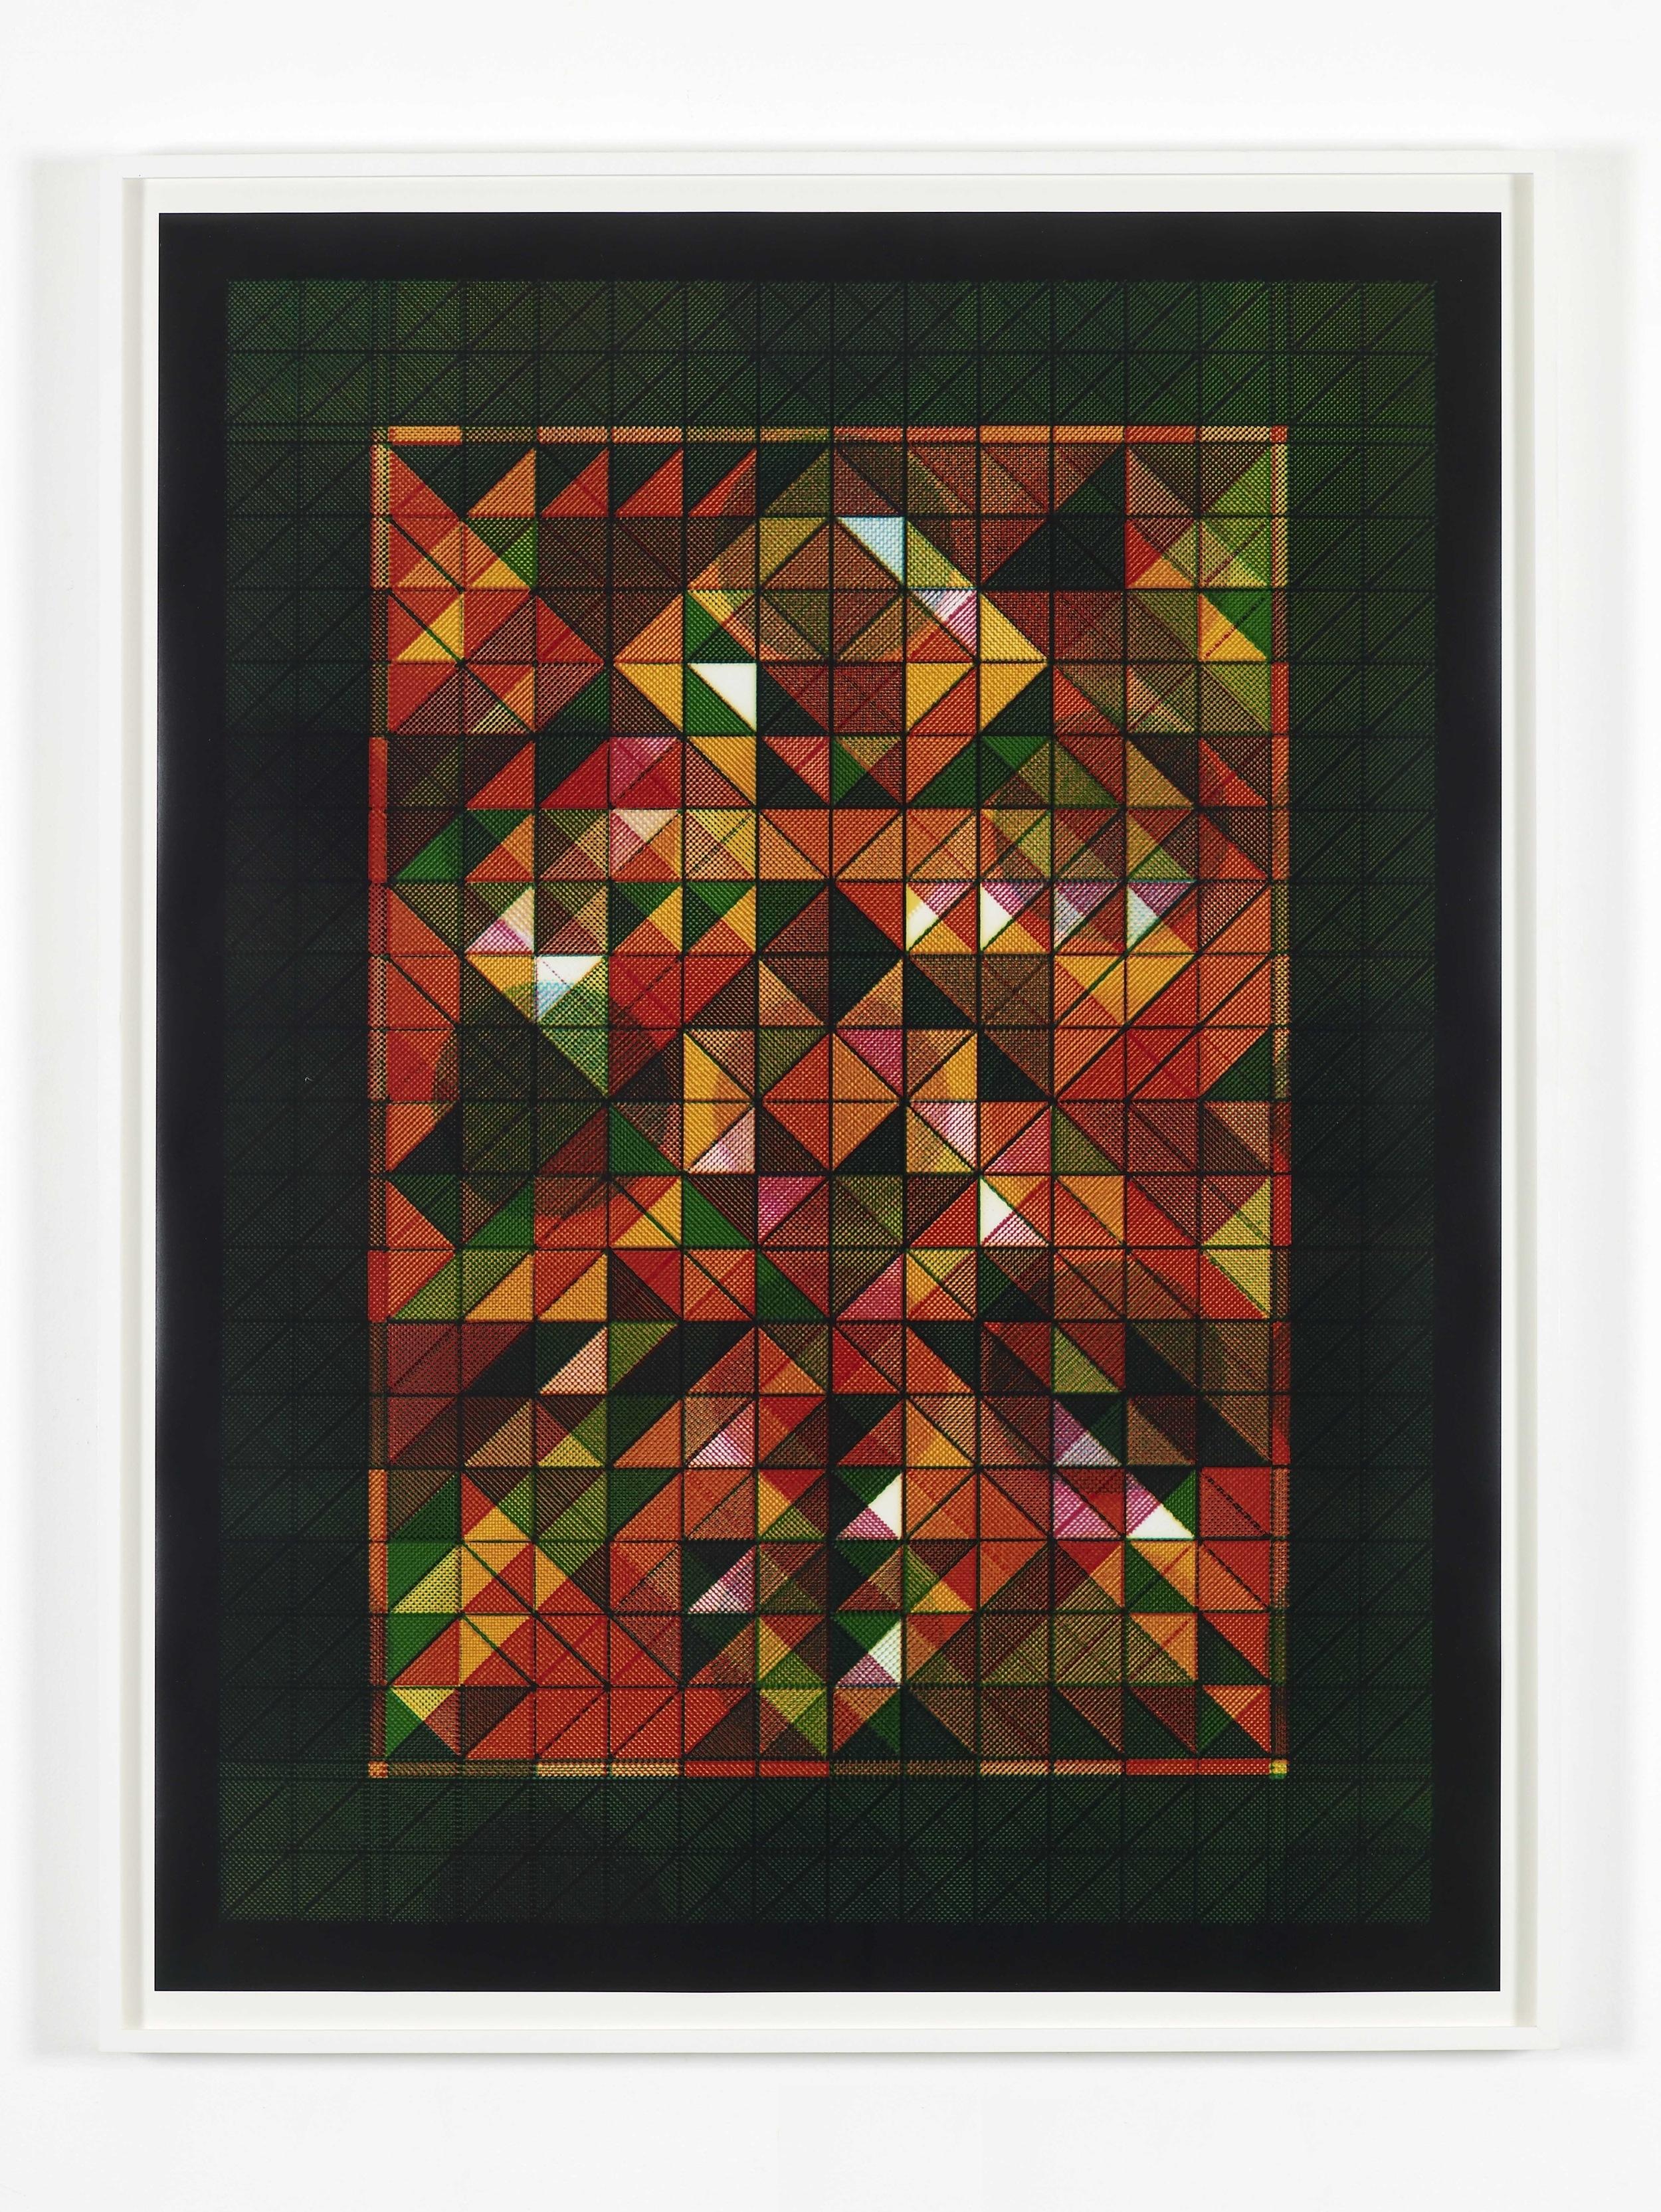 Happy New Year (Moire) 2010 Unique C-Print 101.5 x 76 cm / 40 x 30 in